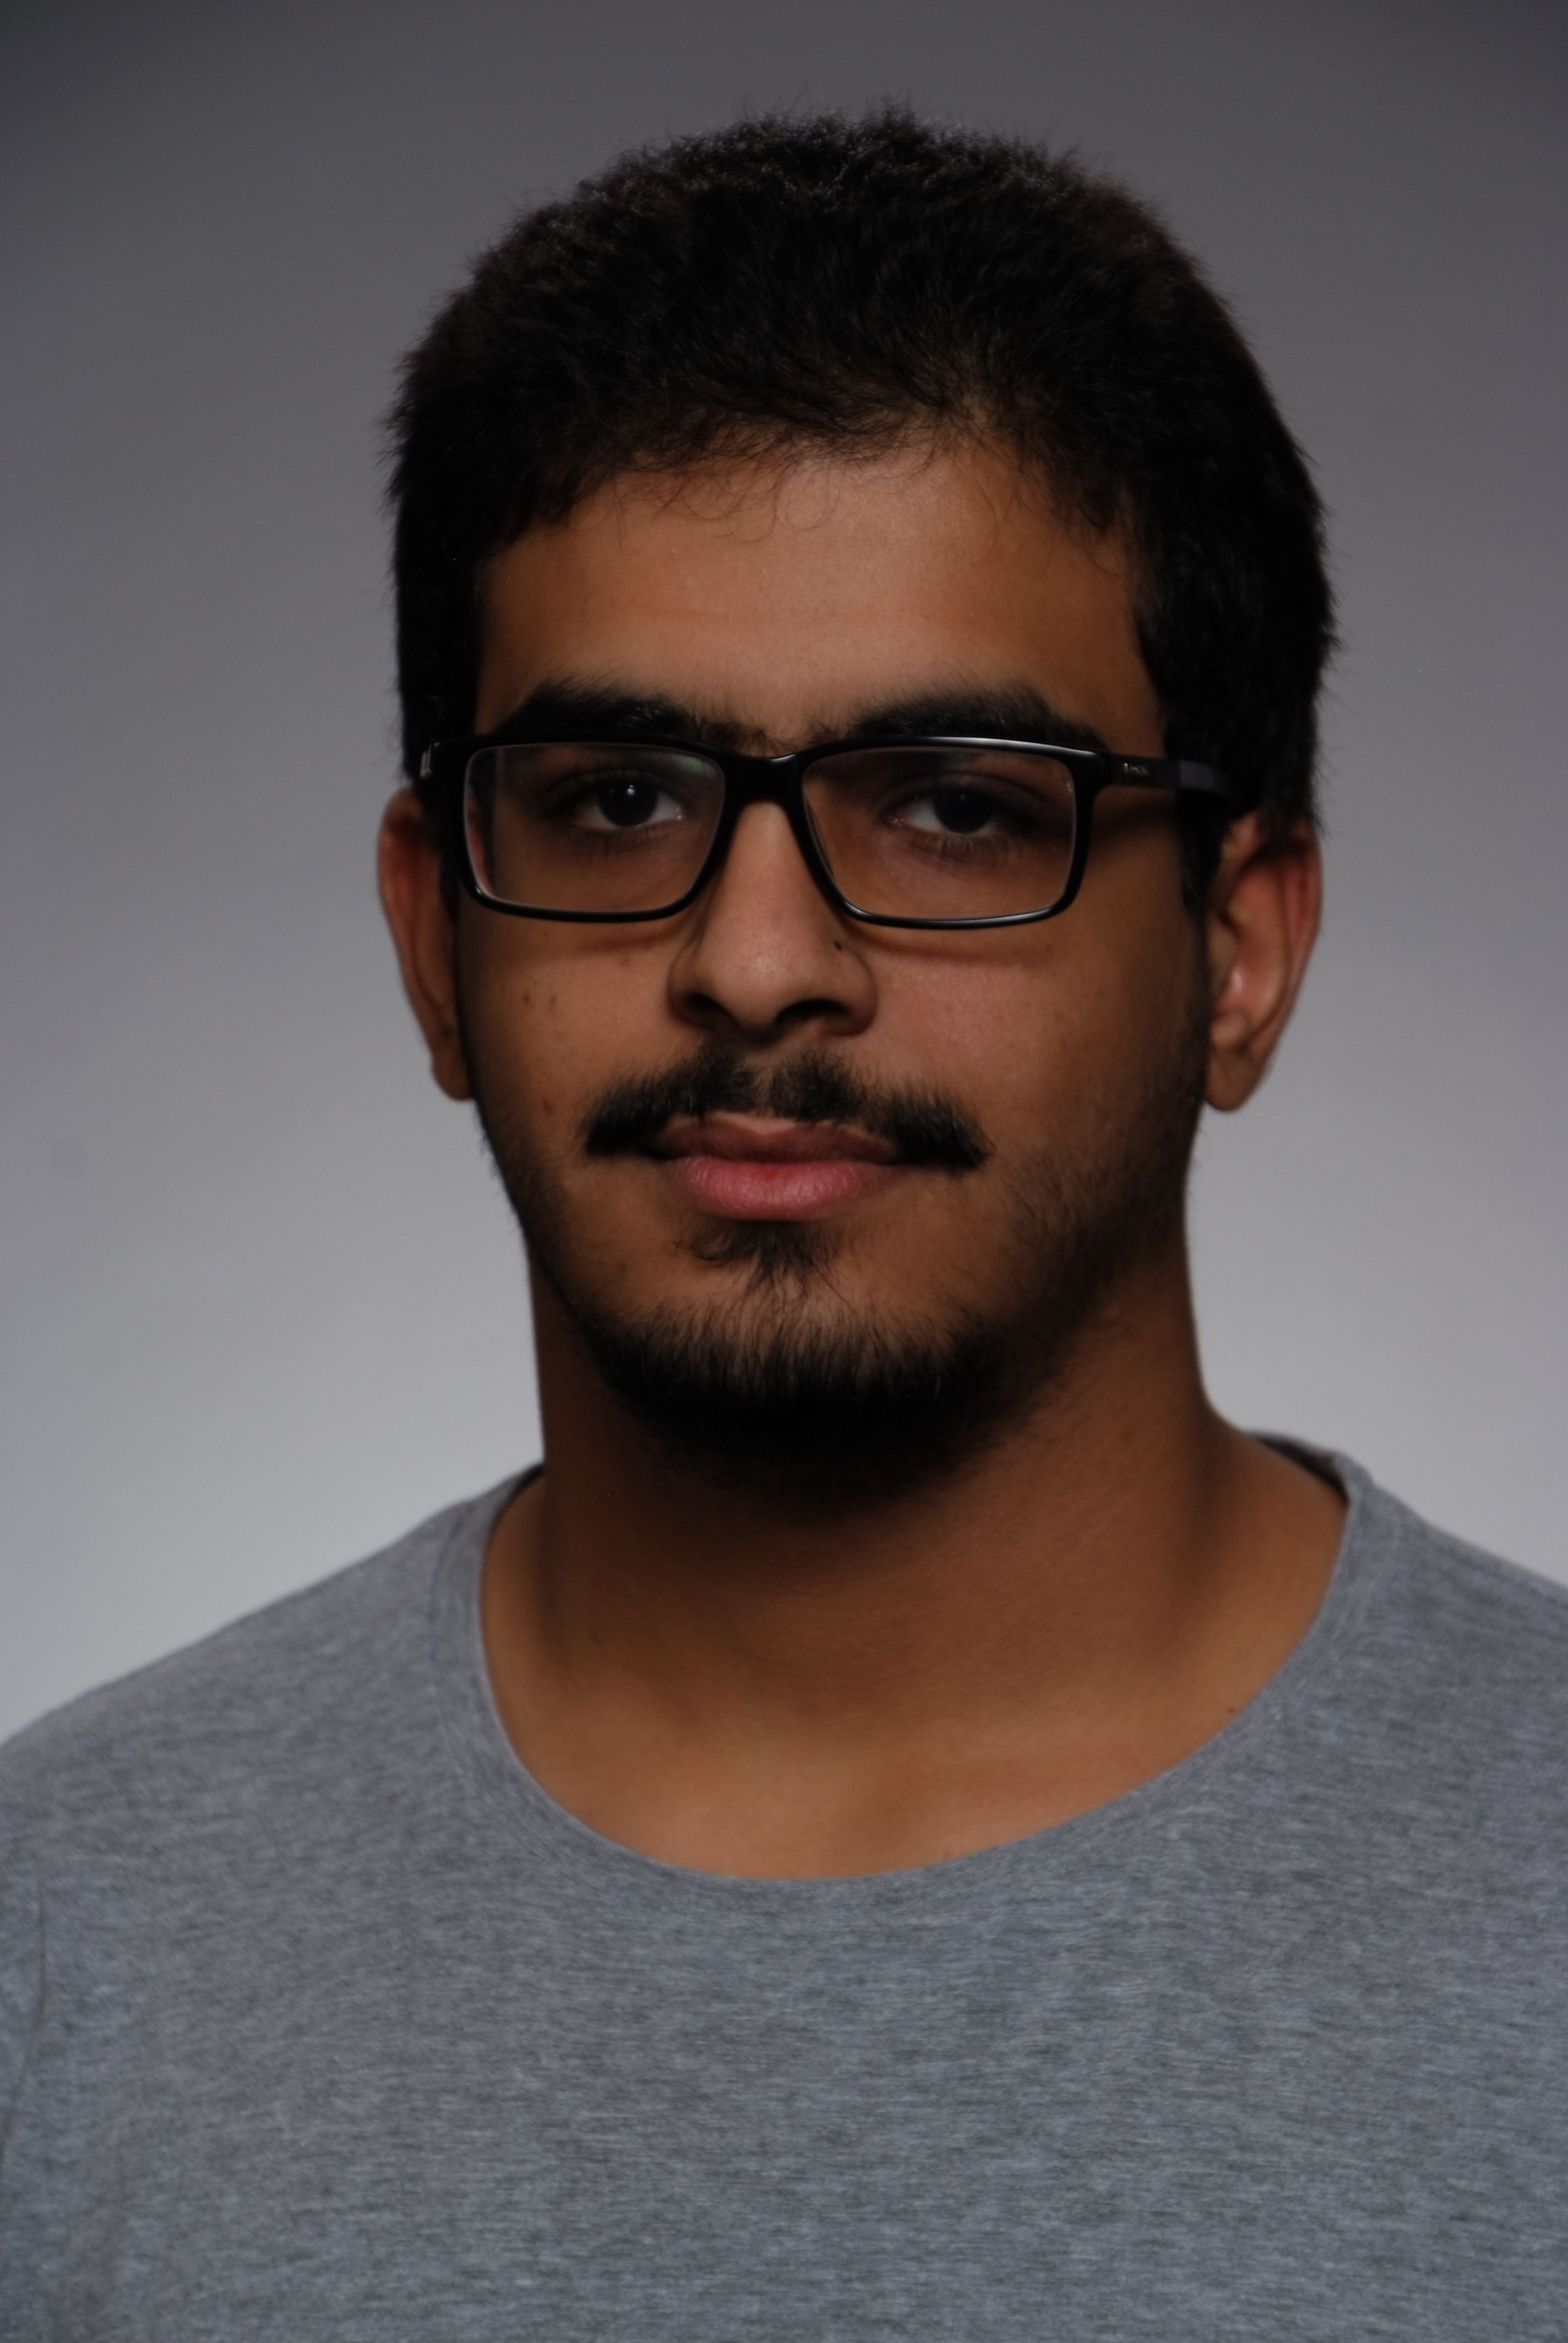 Student Enrichment Spotlight: Yousif Aldolaijan